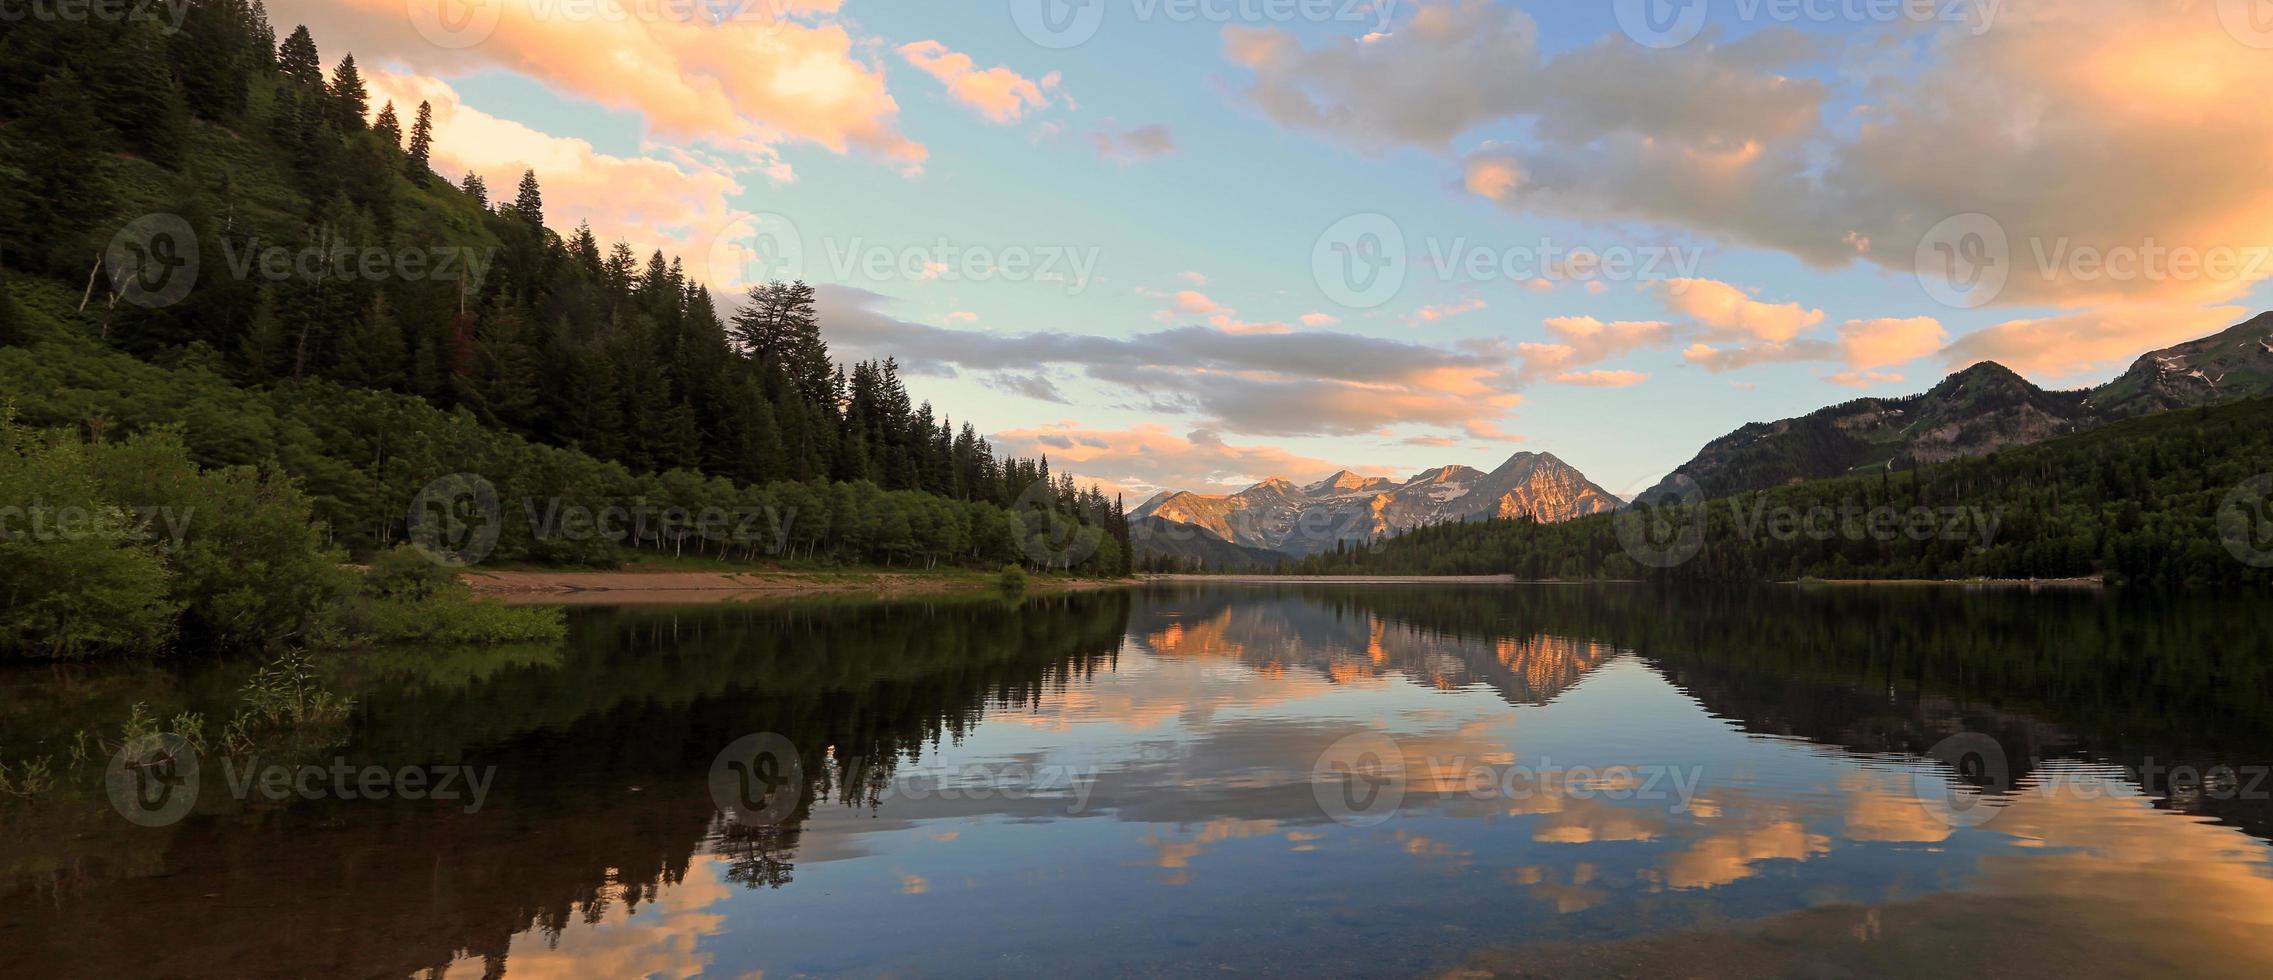 silver sjö solnedgång foto